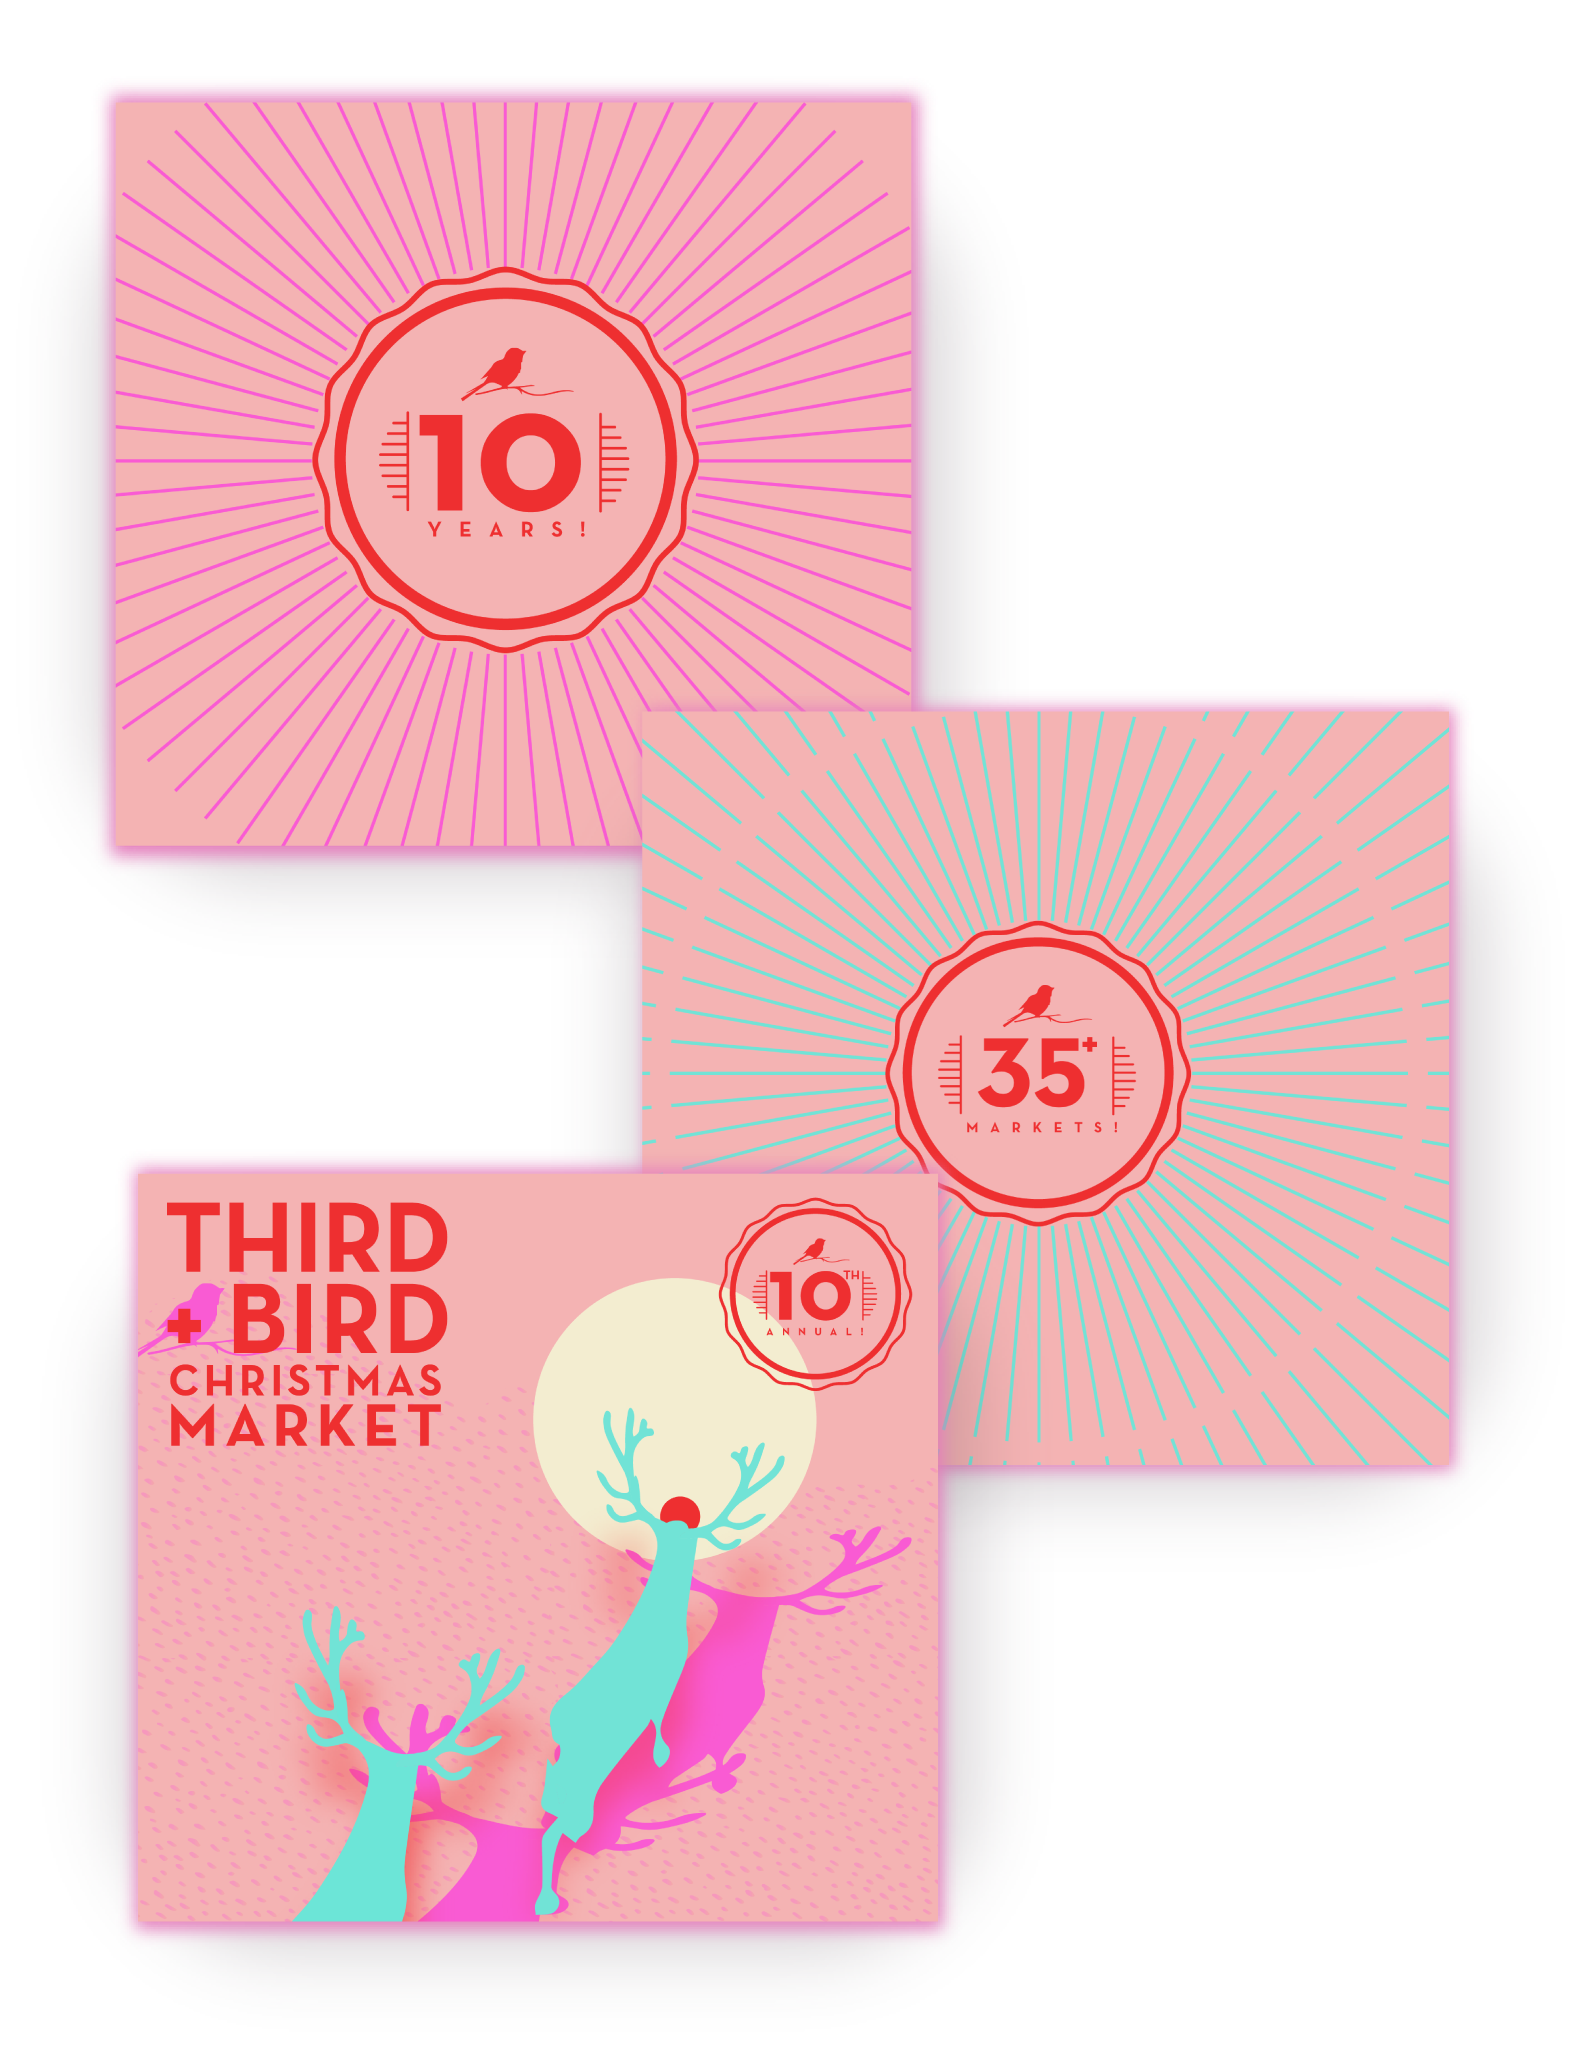 Third + Bird Xmas 2018 Proposed Event Brand